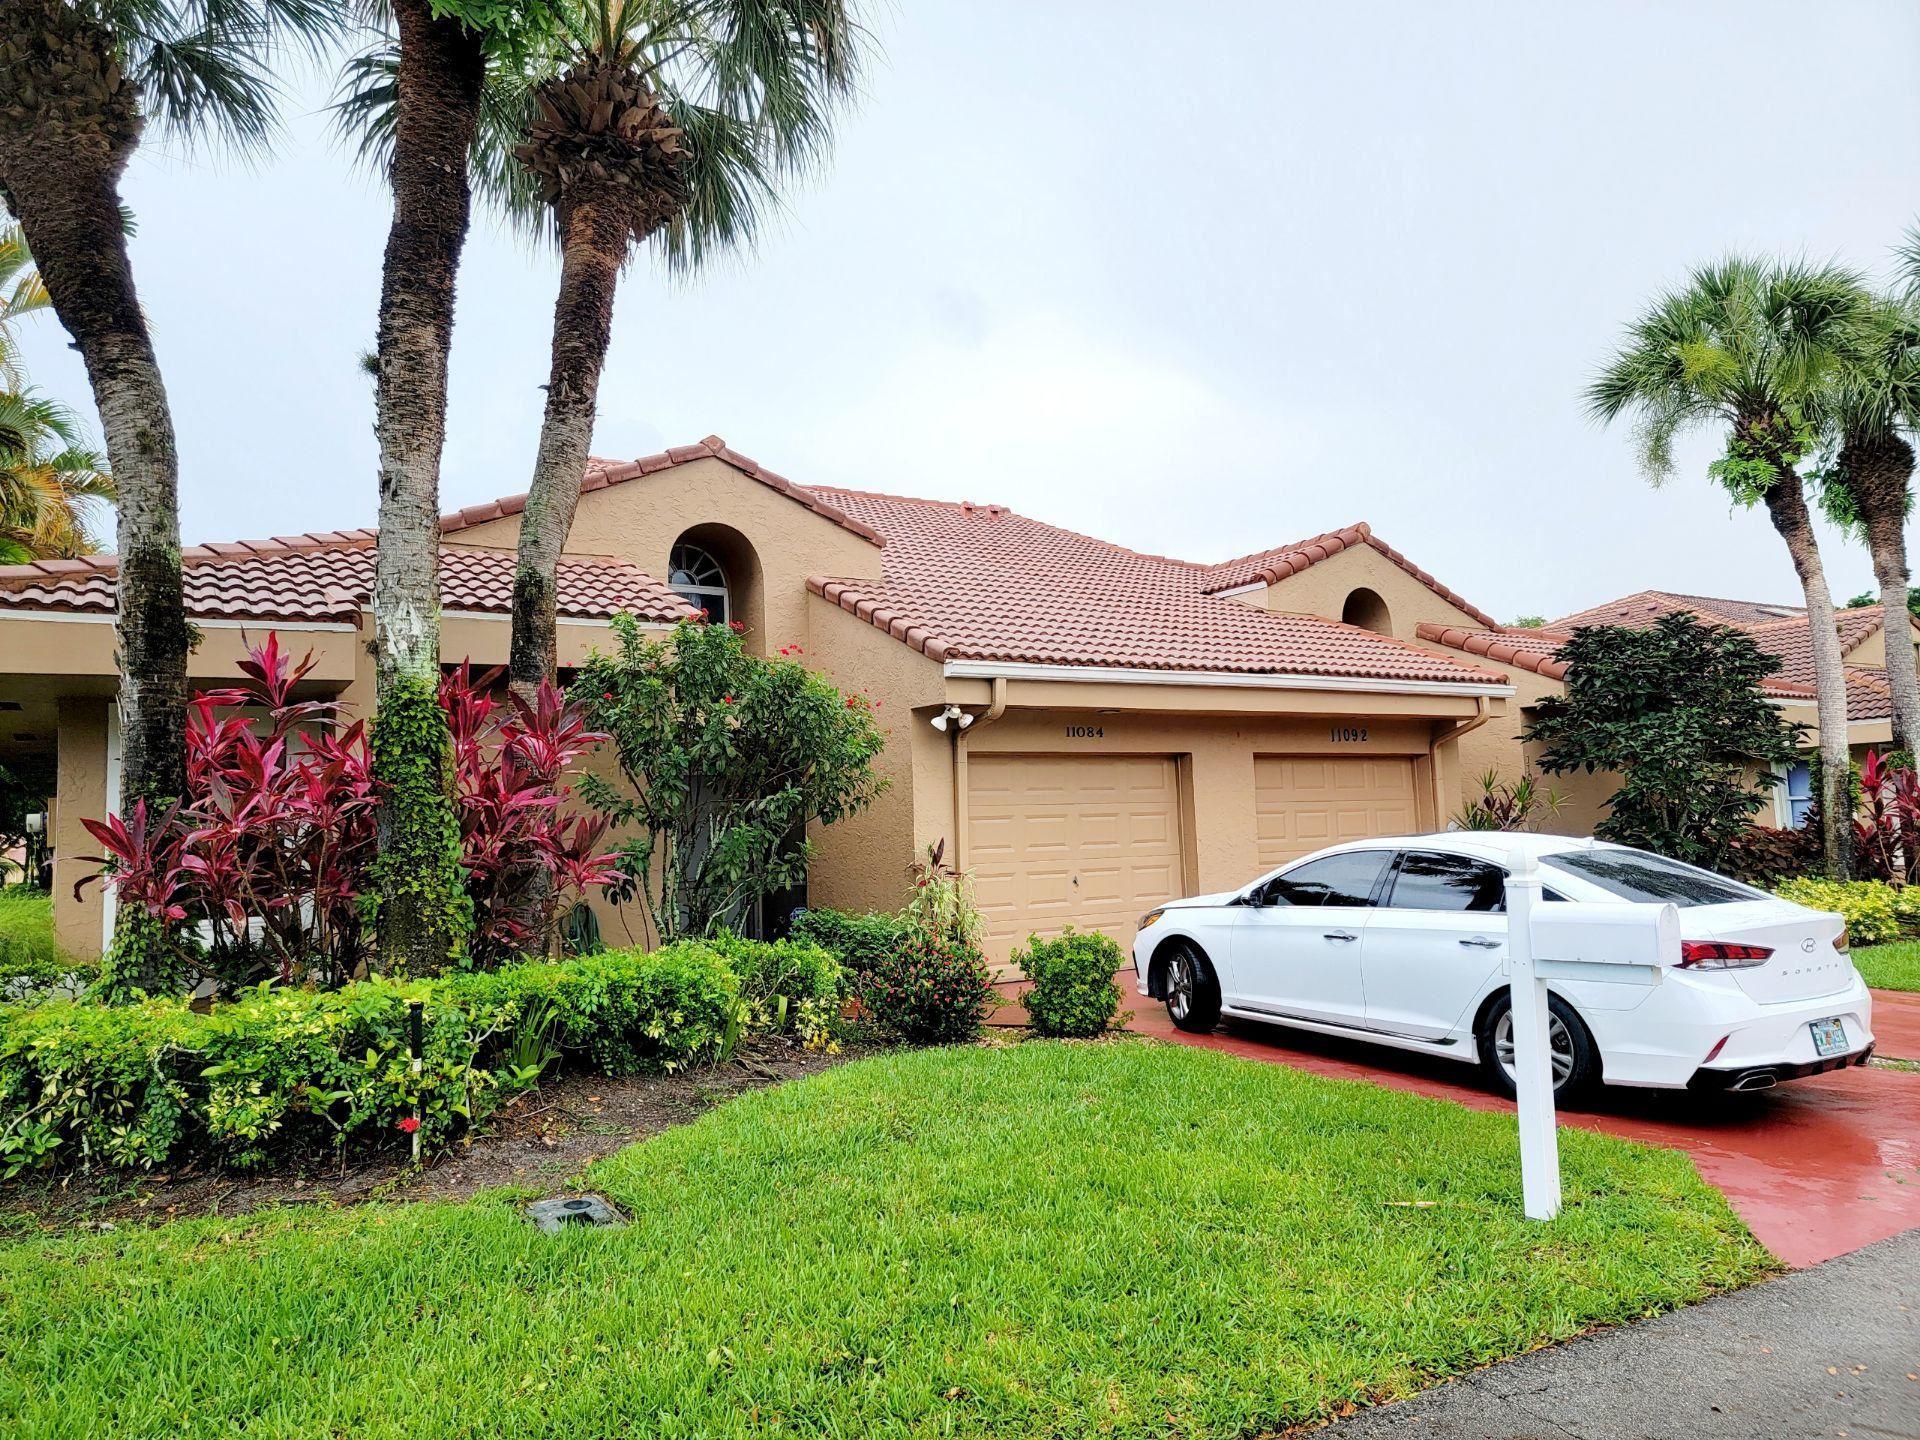 11084 180th Court S, Boca Raton, FL 33498 - #: RX-10732405